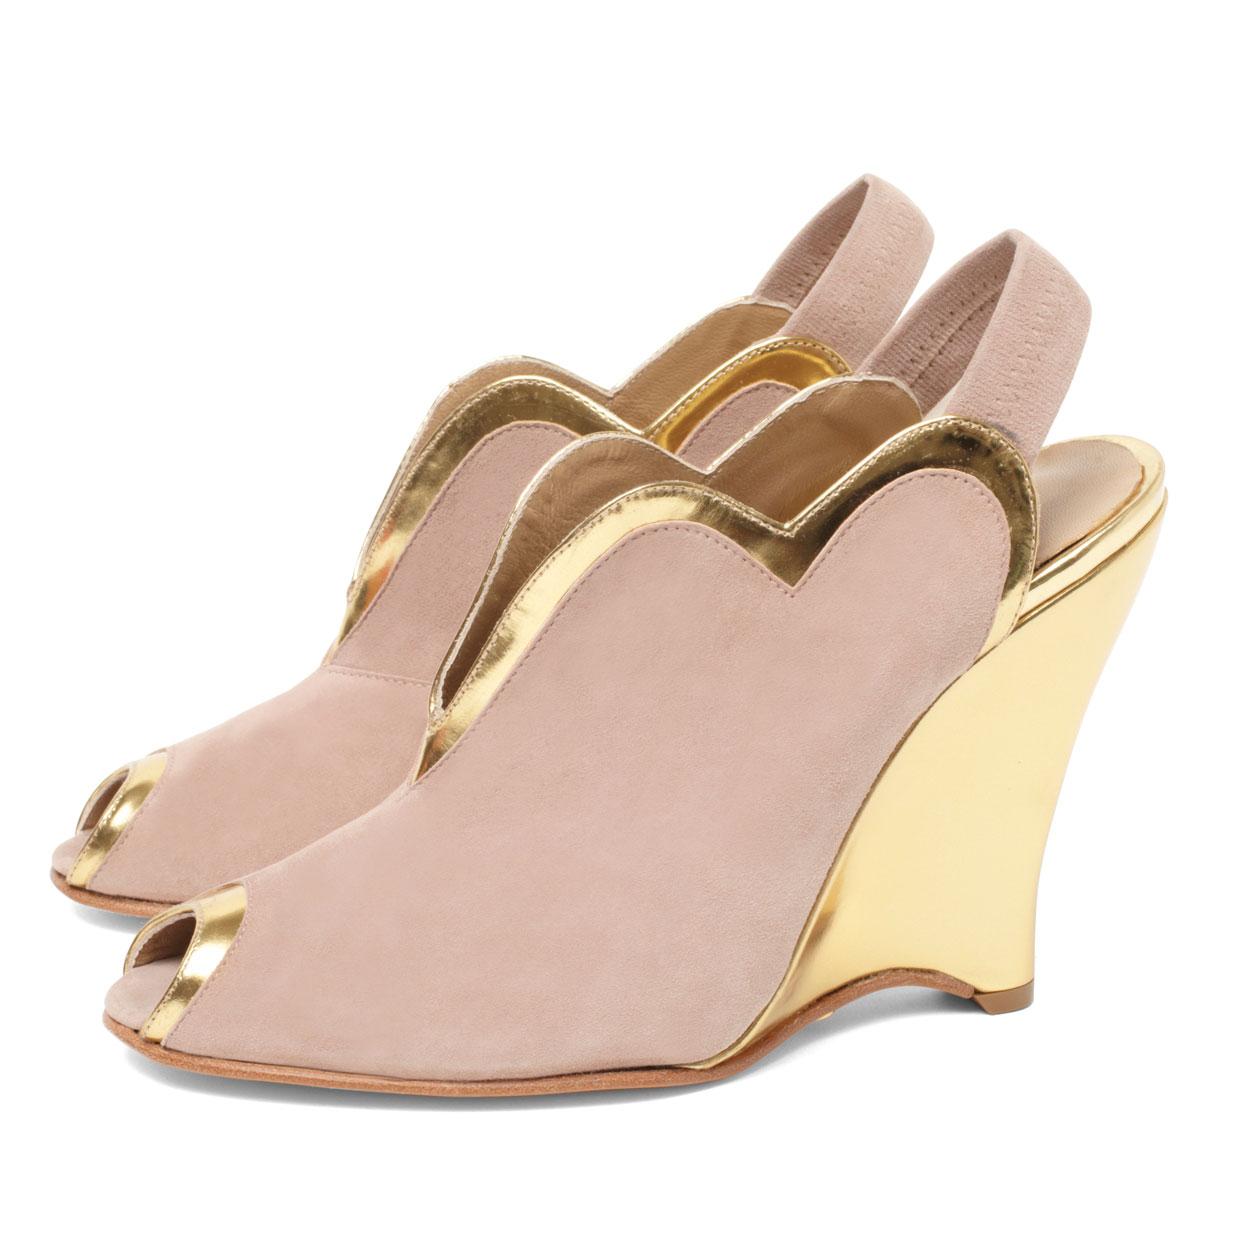 bubble-nude-pair-shoes-cleob-luxury-fashion-heels-shop.jpg